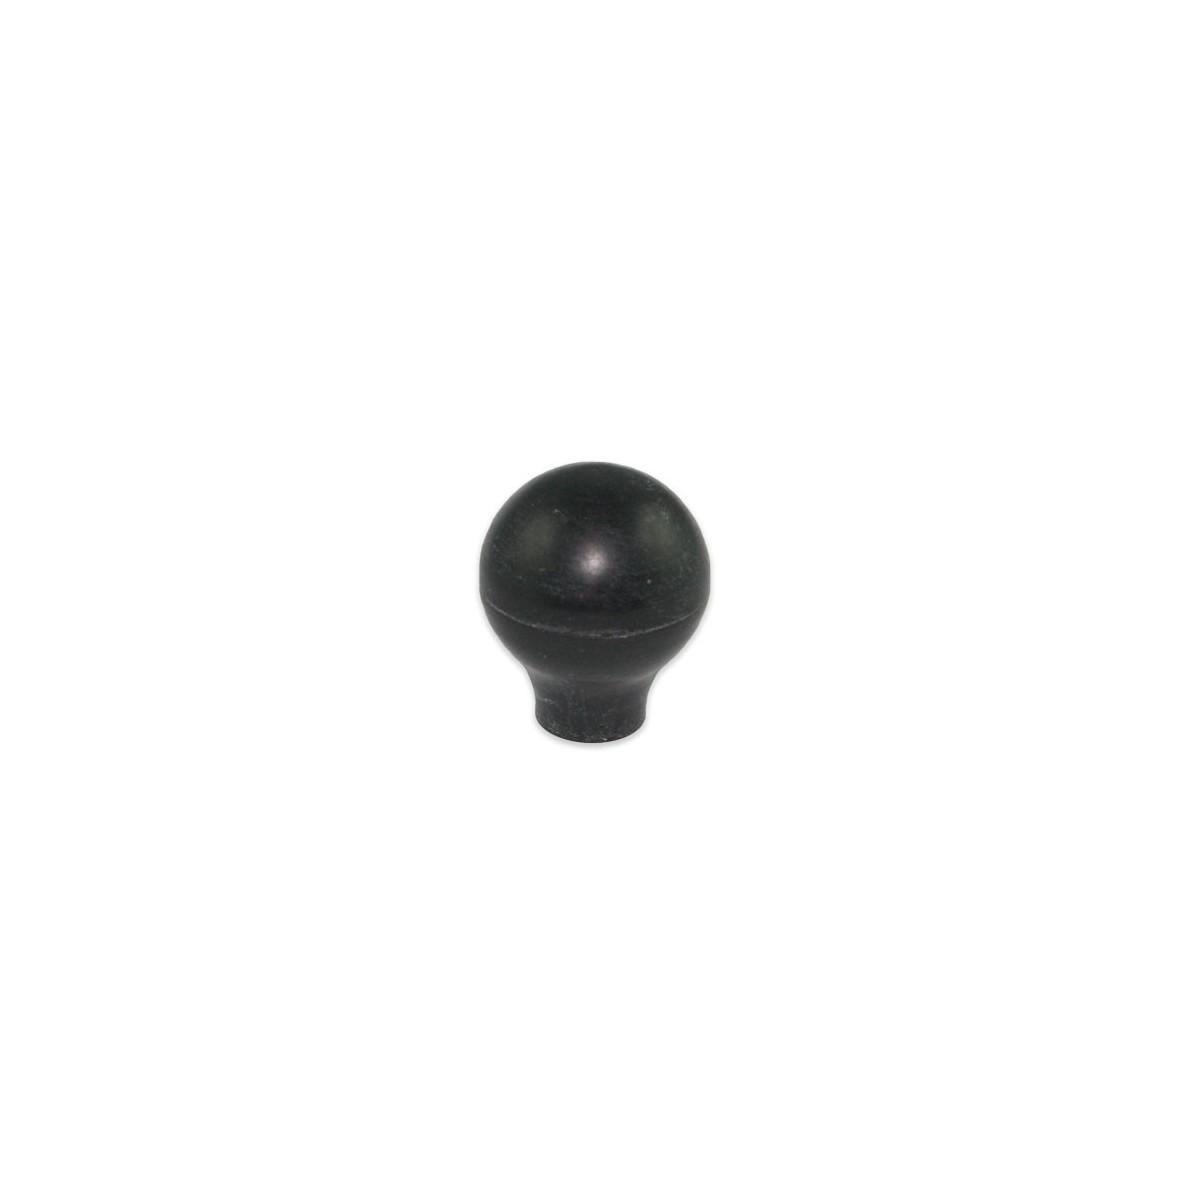 Handgashebel 29-34 mm Iseki TS -für alle Modelle